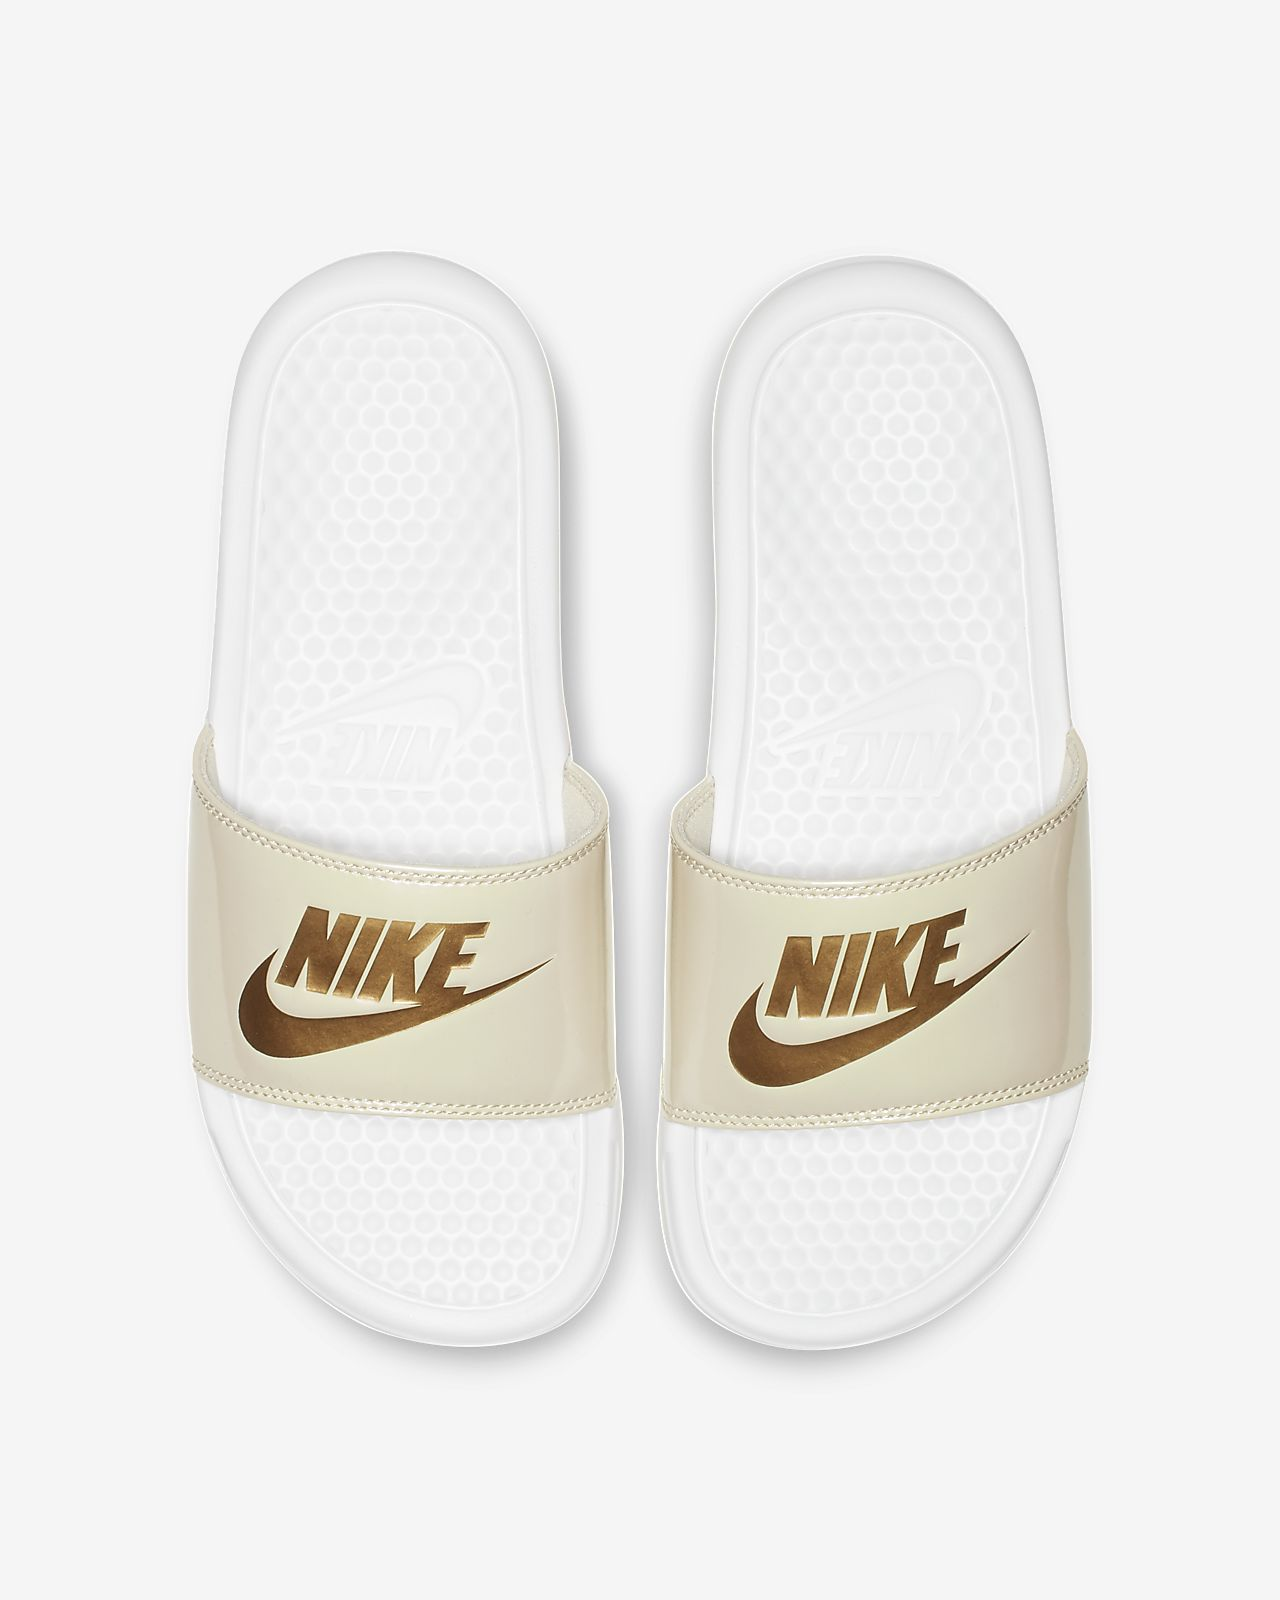 093af0c67f77 Nike Benassi JDI Metallic Women s Slide. Nike.com PT